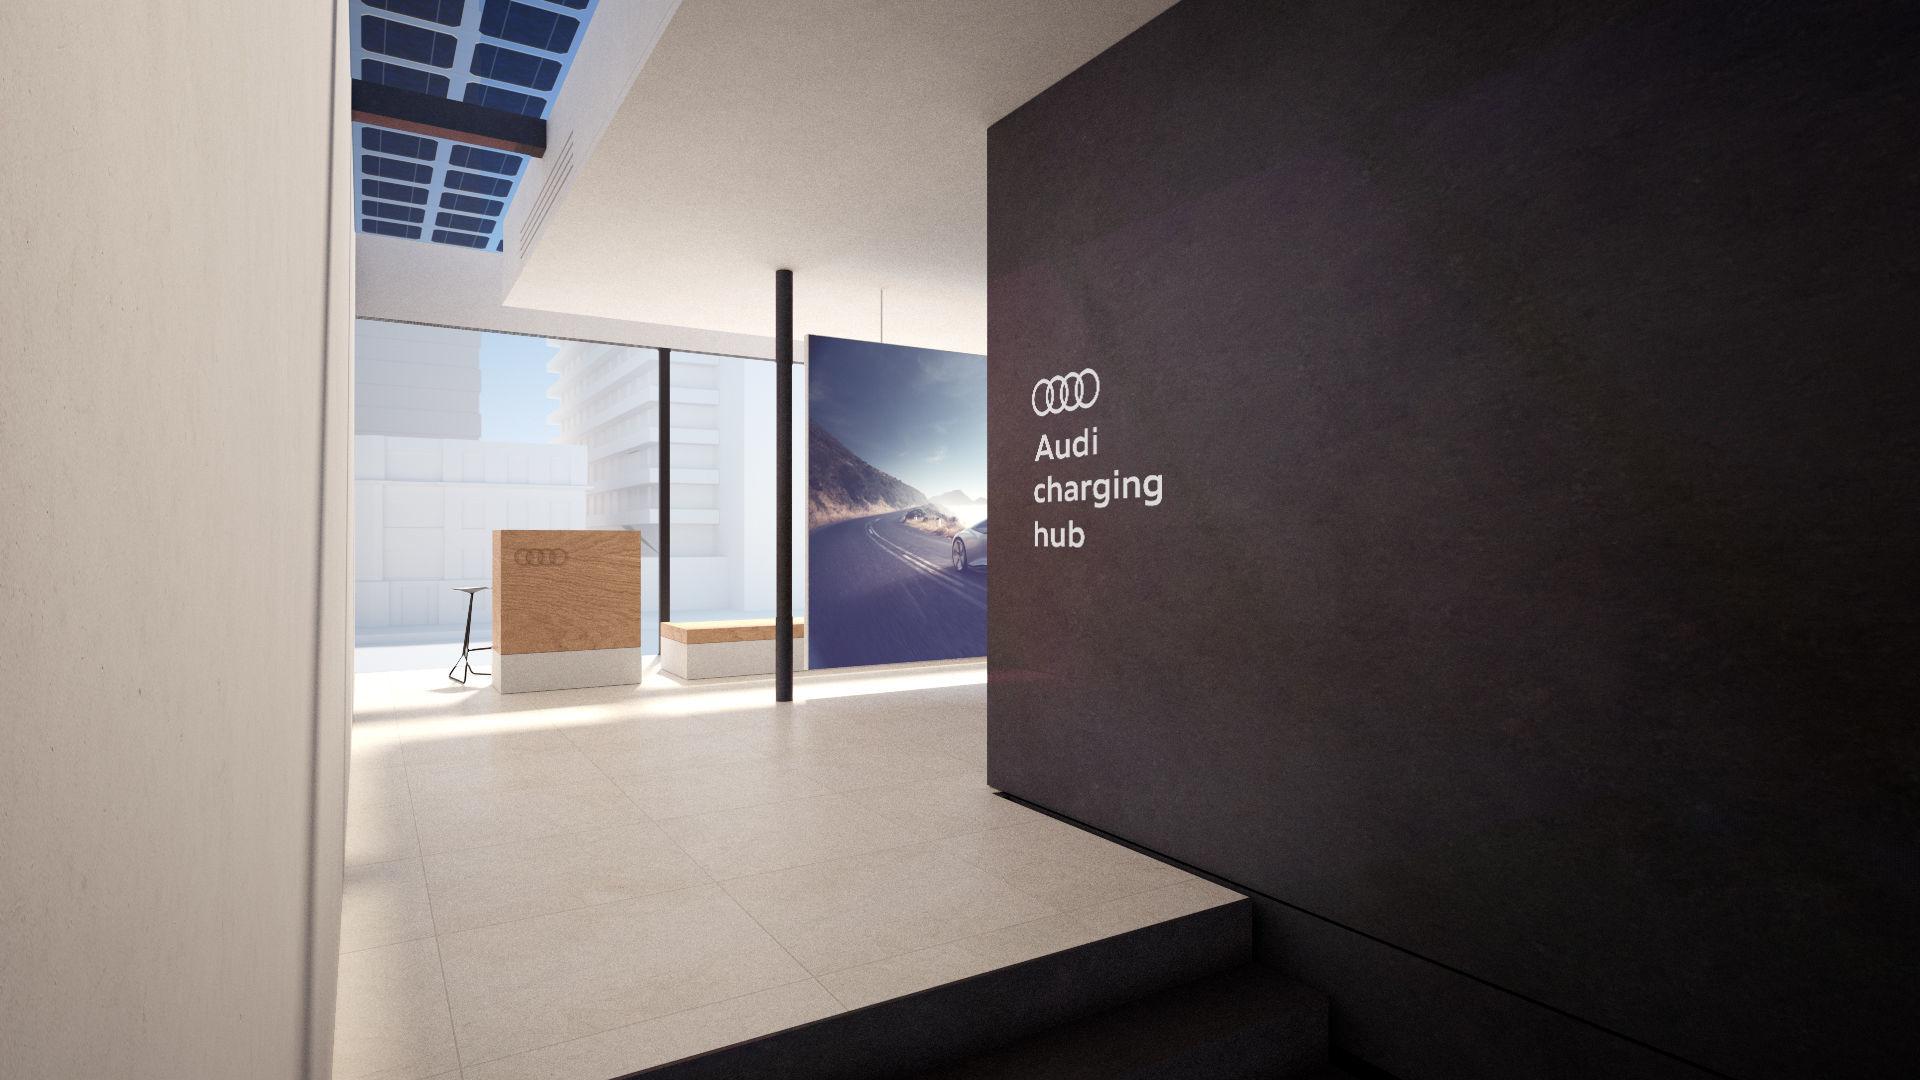 Audi pilots concept for quick charging - Image 2